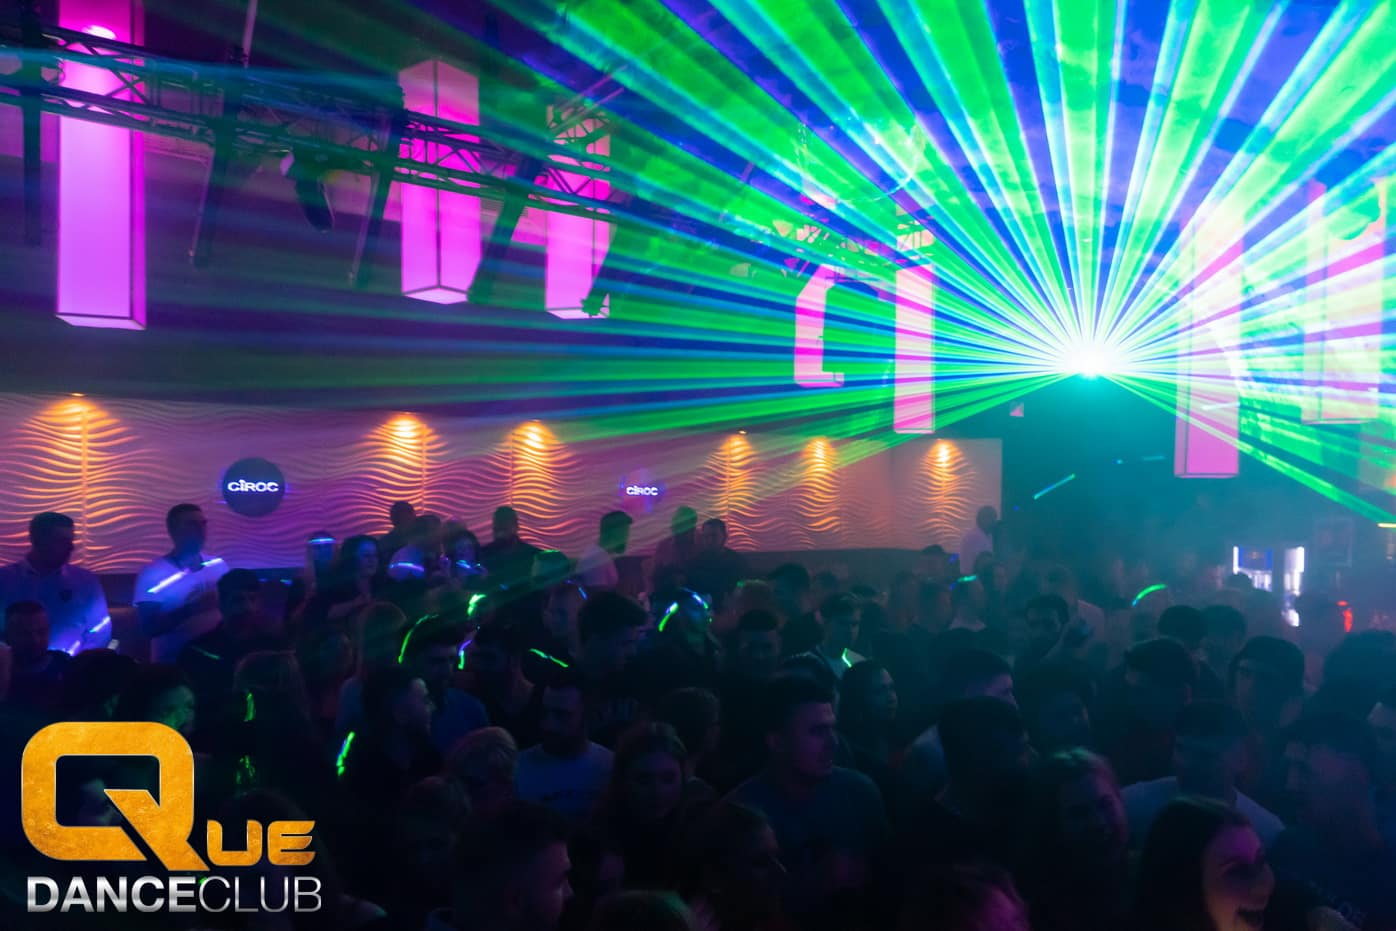 2018_12_08_Que_Danceclub_Paparazzo_Night_Ardian_Bujupi_Live_Nightlife_Scene_Timo_045